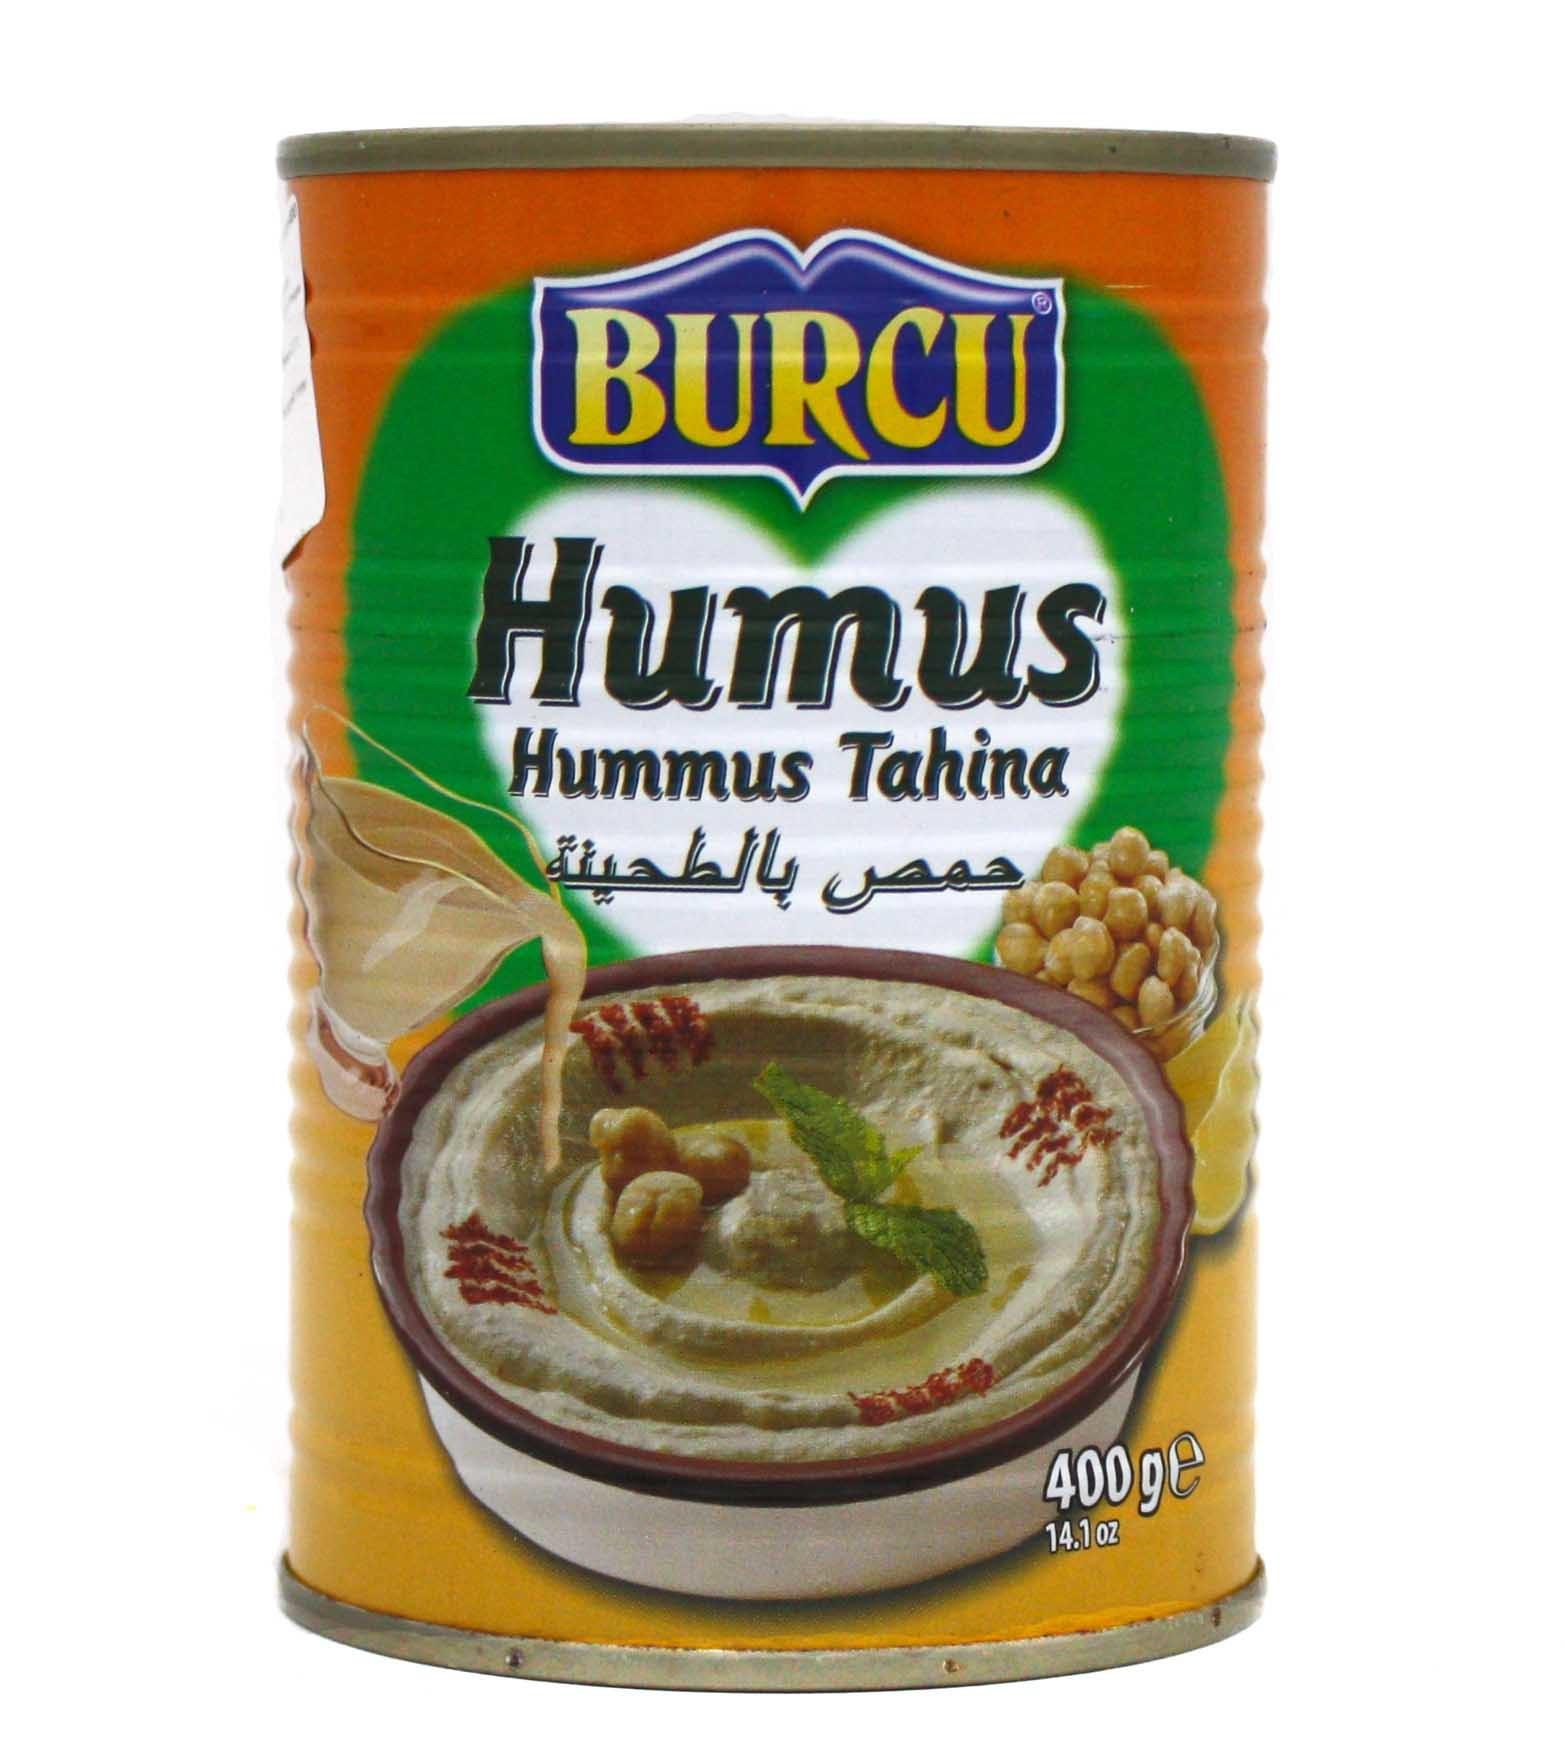 Burcu Хумус, Burcu, 400 г import_files_2b_2b9b0299f71c11eaa9d3484d7ecee297_a99c234bf96d11eaa9d4484d7ecee297.jpg